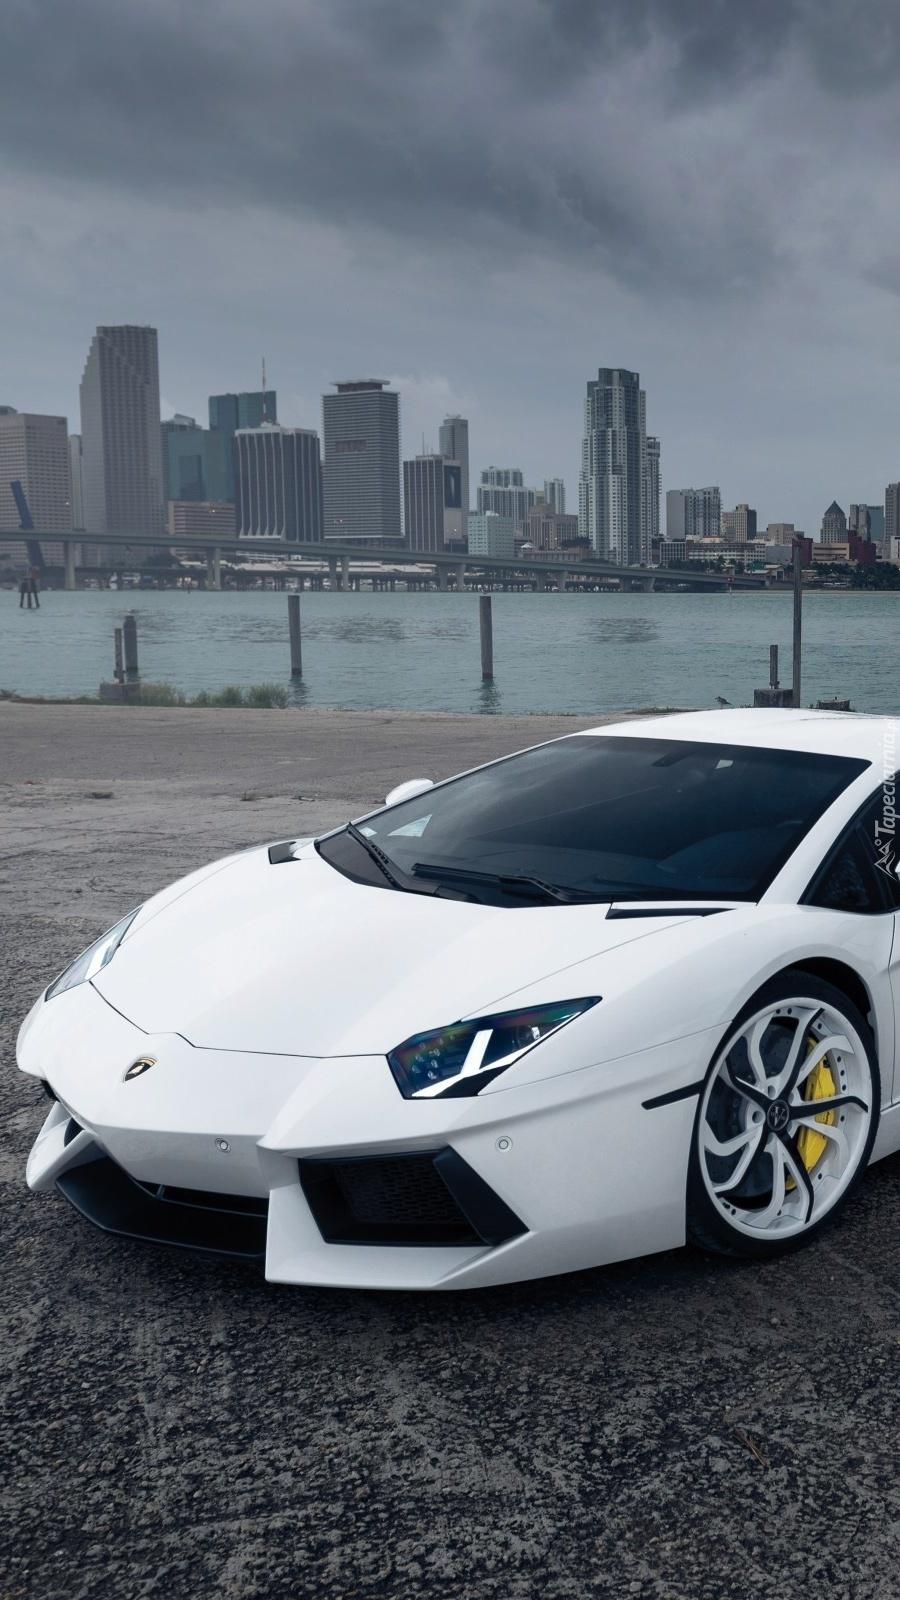 Białe Lamborghini Aventador